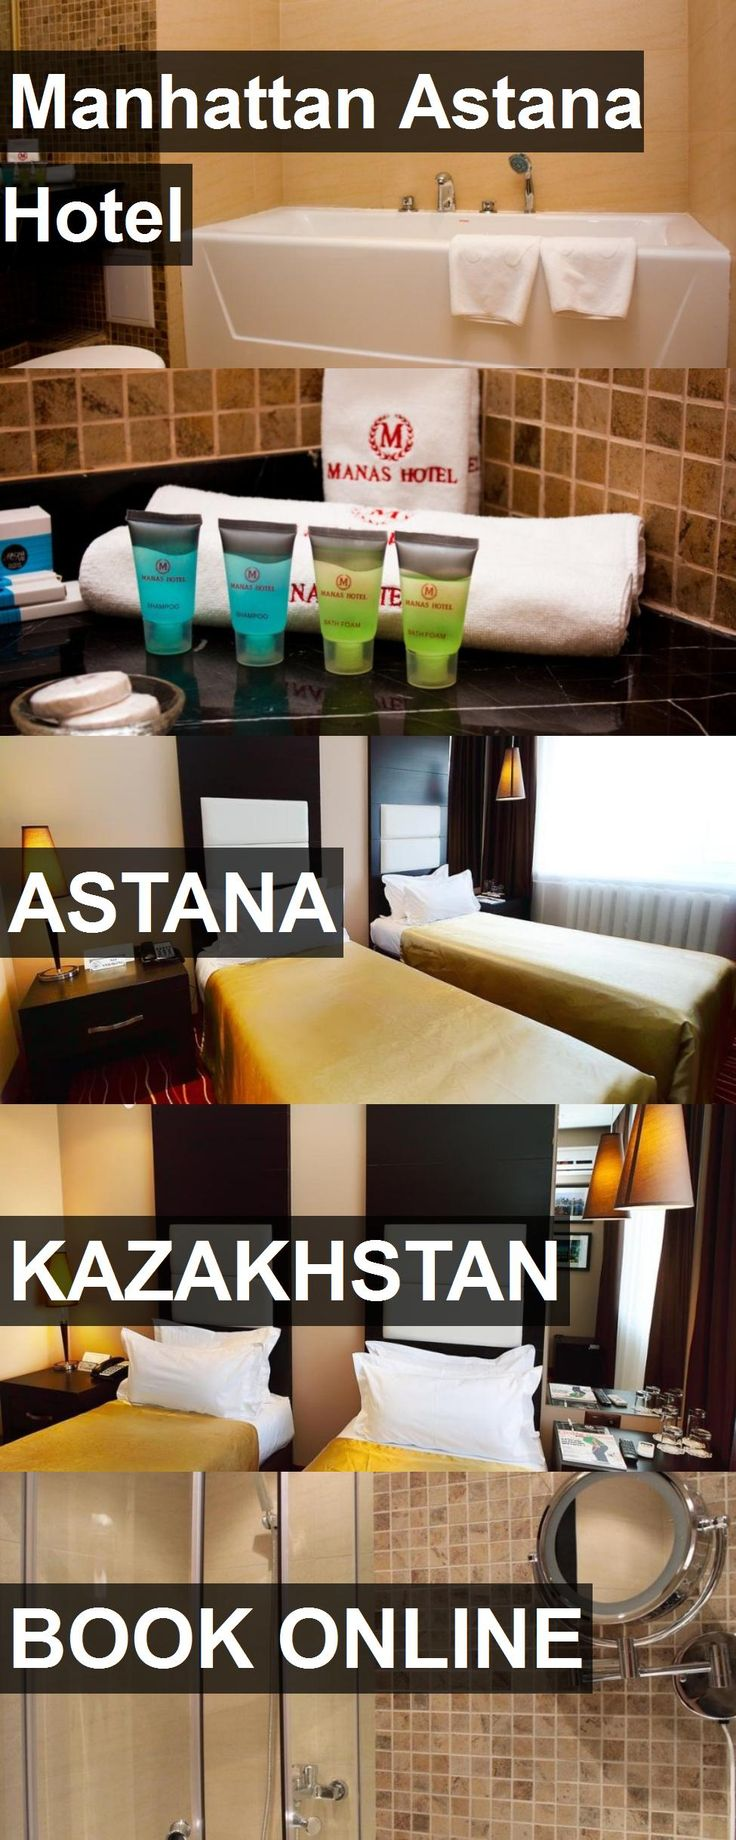 Hotel Manhattan Astana Hotel in Astana, Kazakhstan. For more information, photos, reviews and best prices please follow the link. #Kazakhstan #Astana #ManhattanAstanaHotel #hotel #travel #vacation